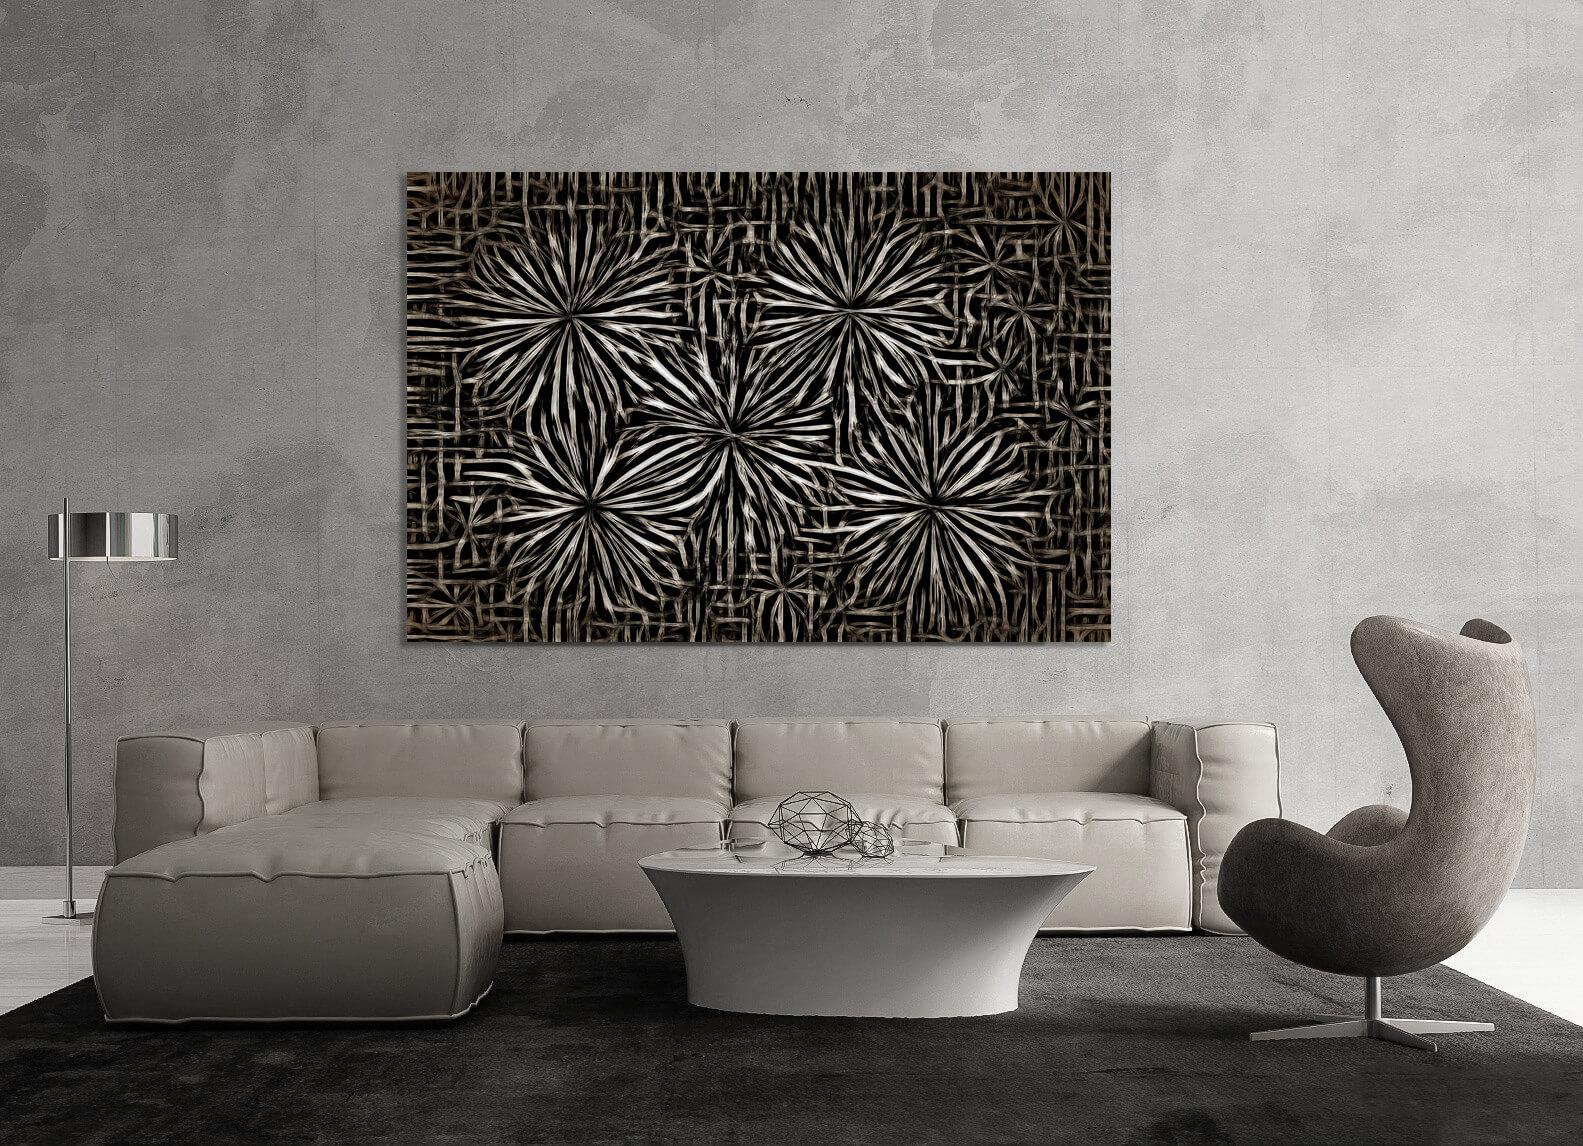 Steel Flowers interior